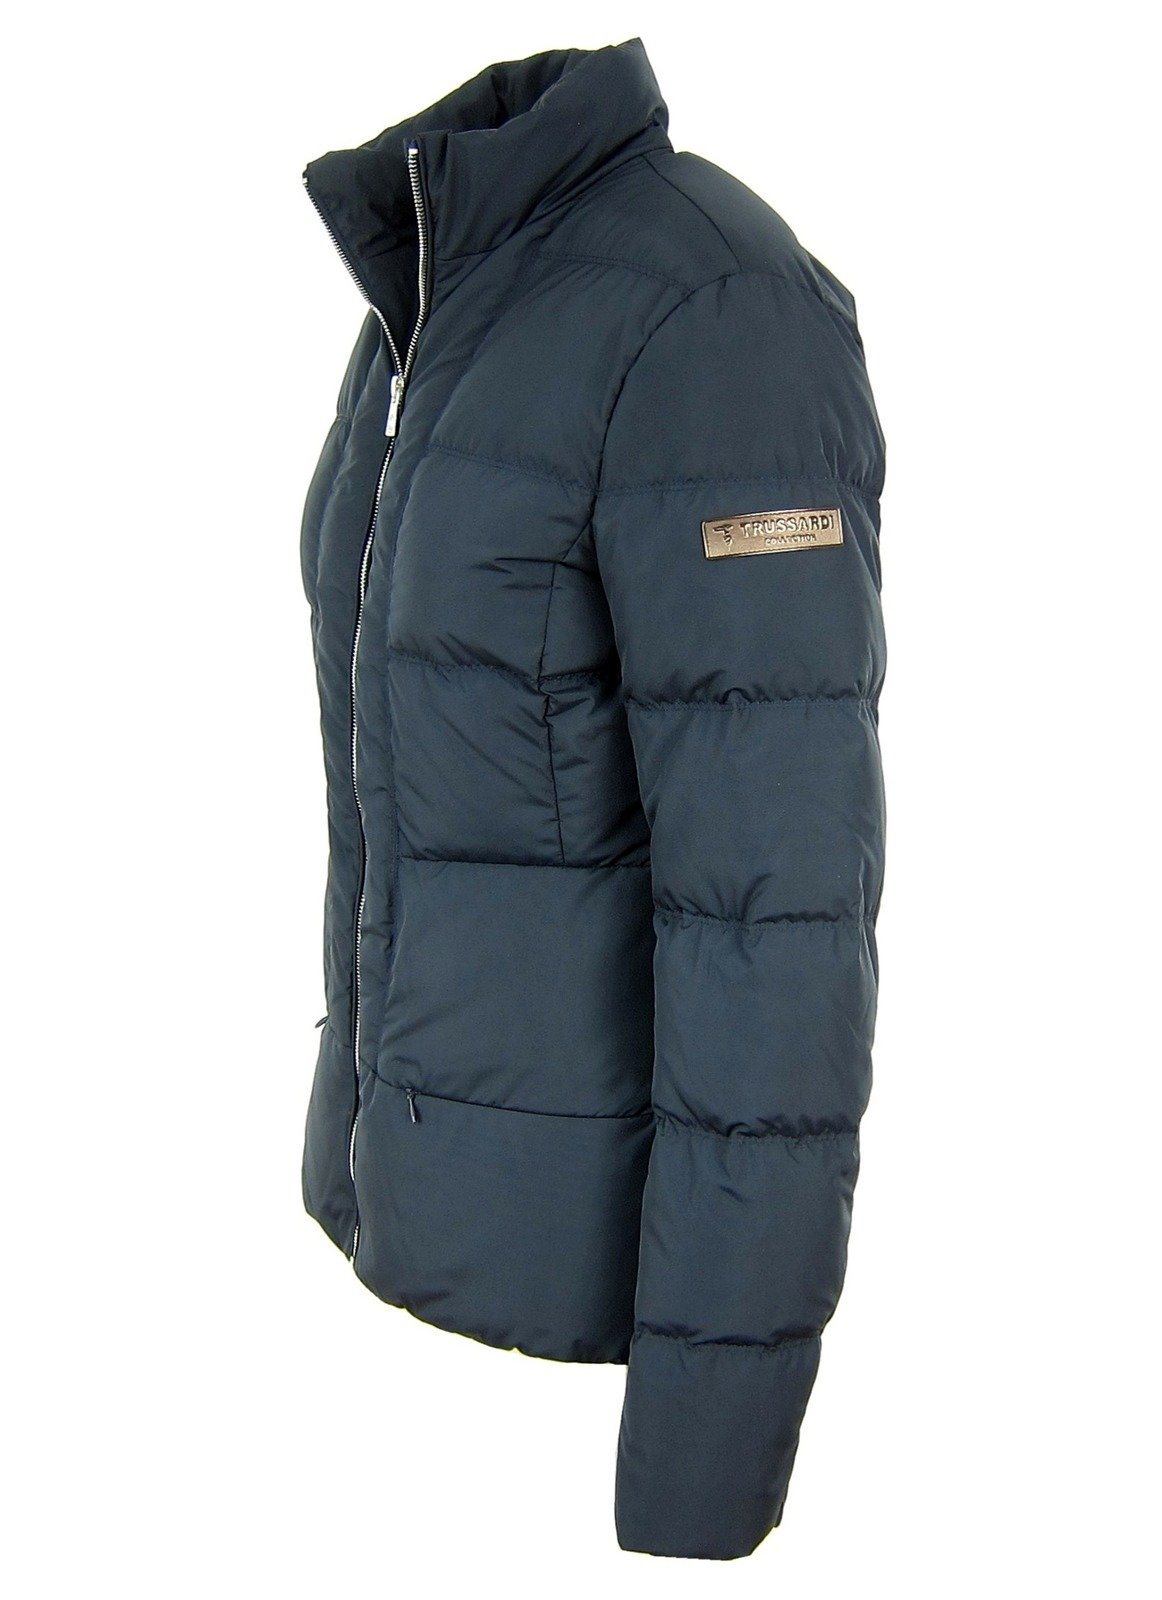 Details zu TRUSSARDI Collection Exver Maiolo Damen Women Daunen Jacke Down Jacket Navy Grau